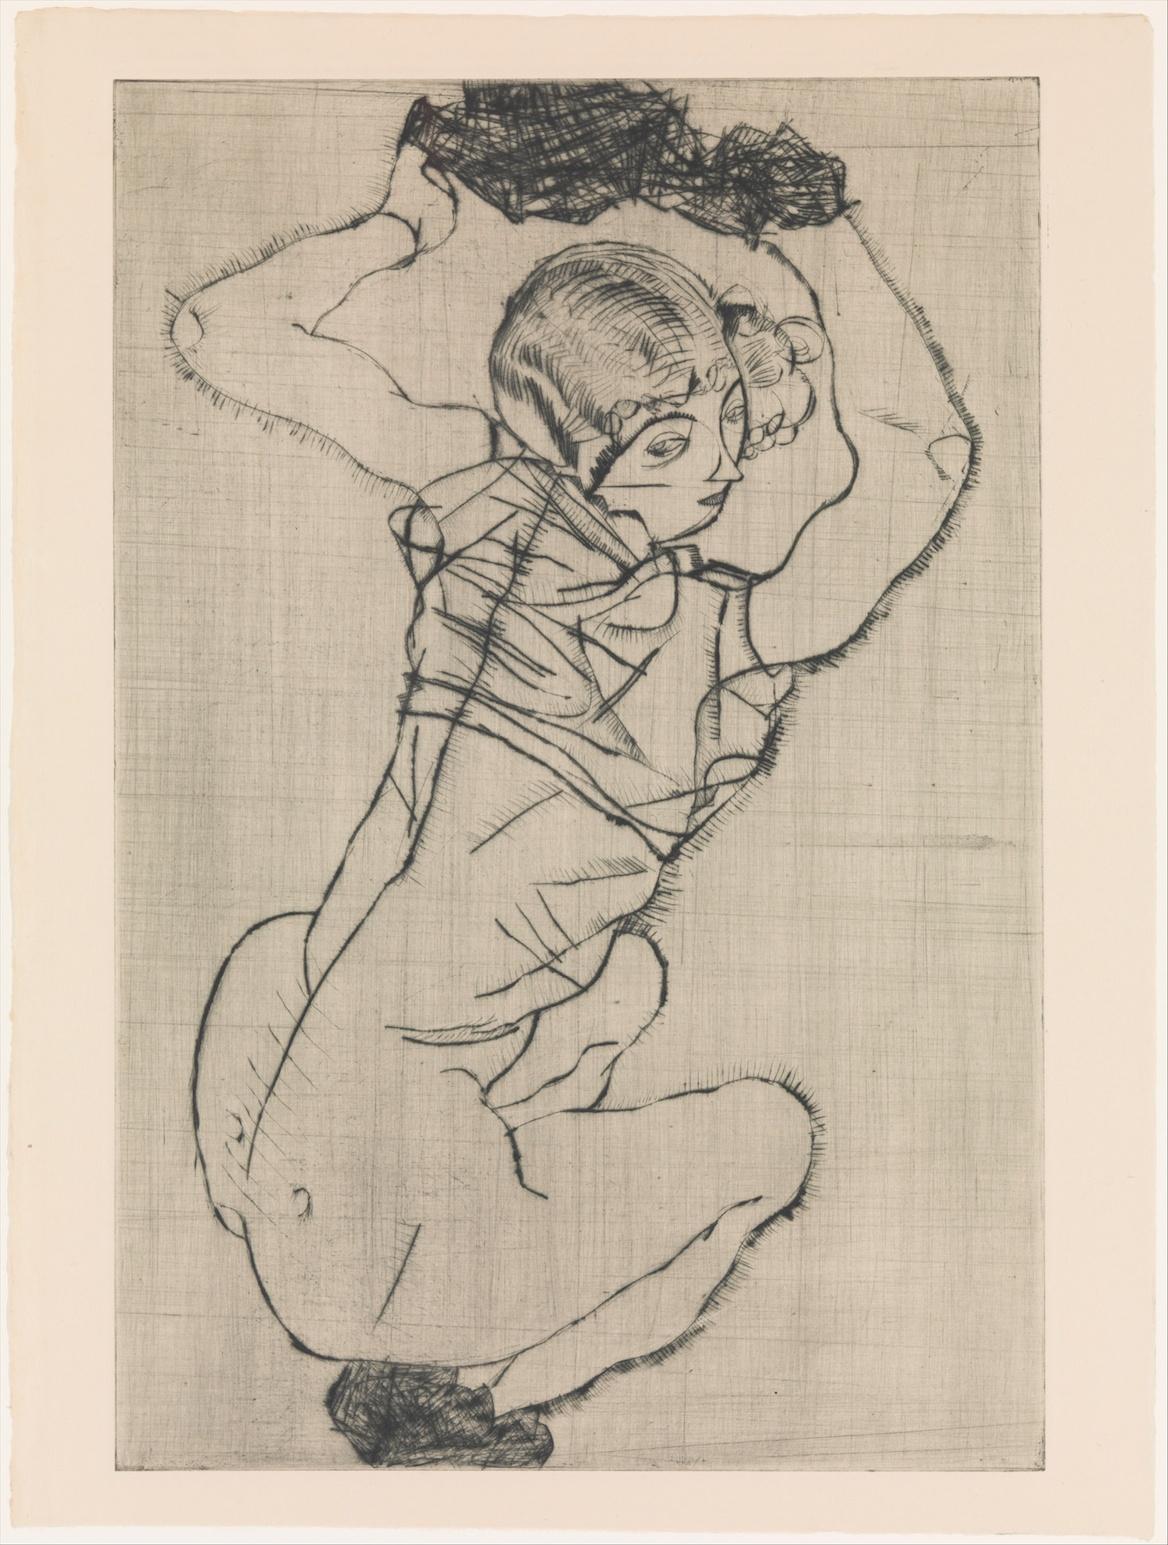 Egon Schiele - Squatting Woman - Drypoint - 1914